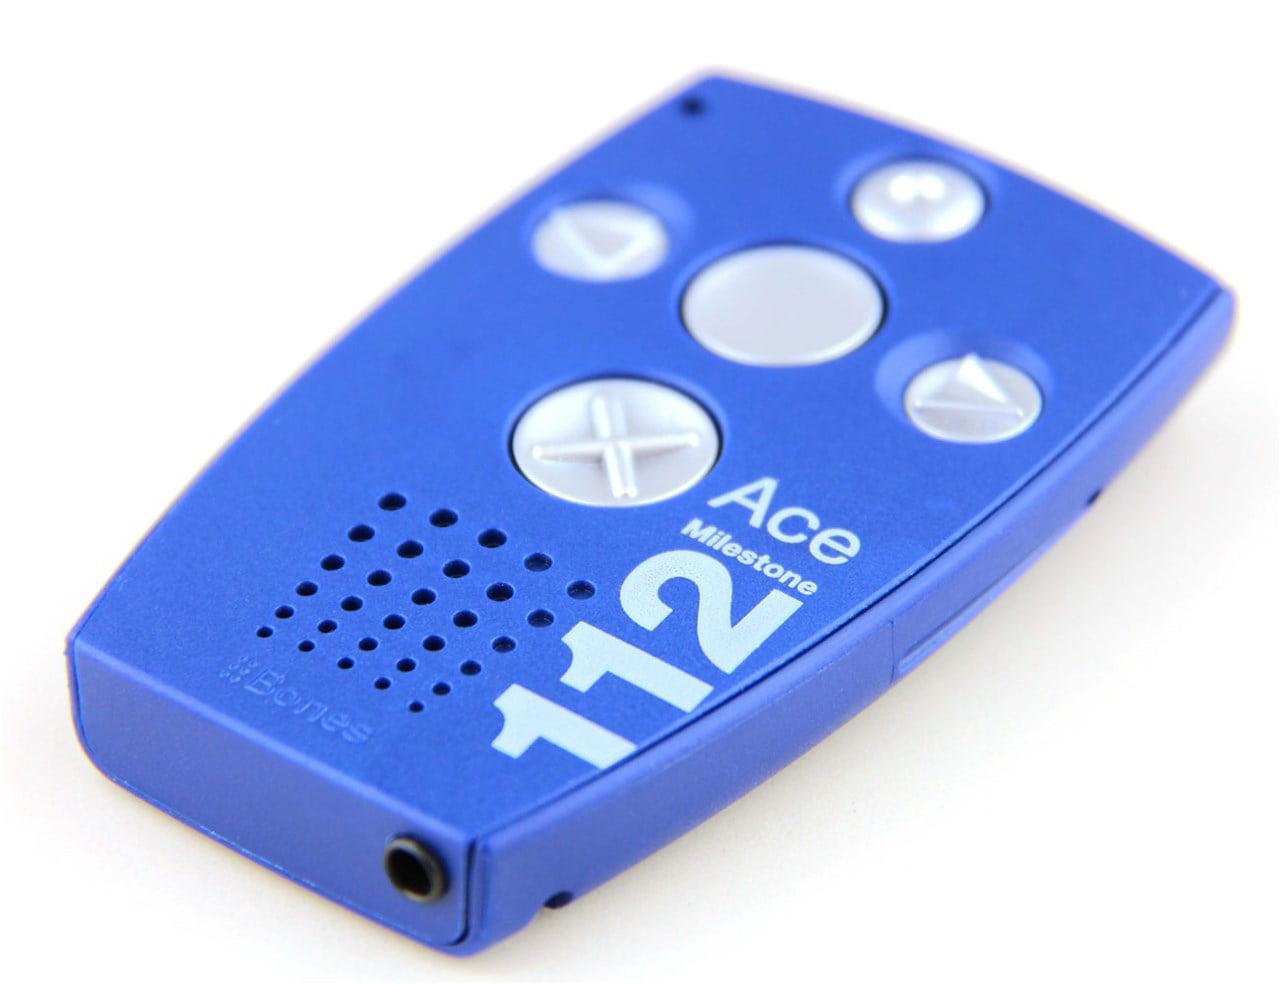 Milestone 112 Ace Voice Recorder by Bones